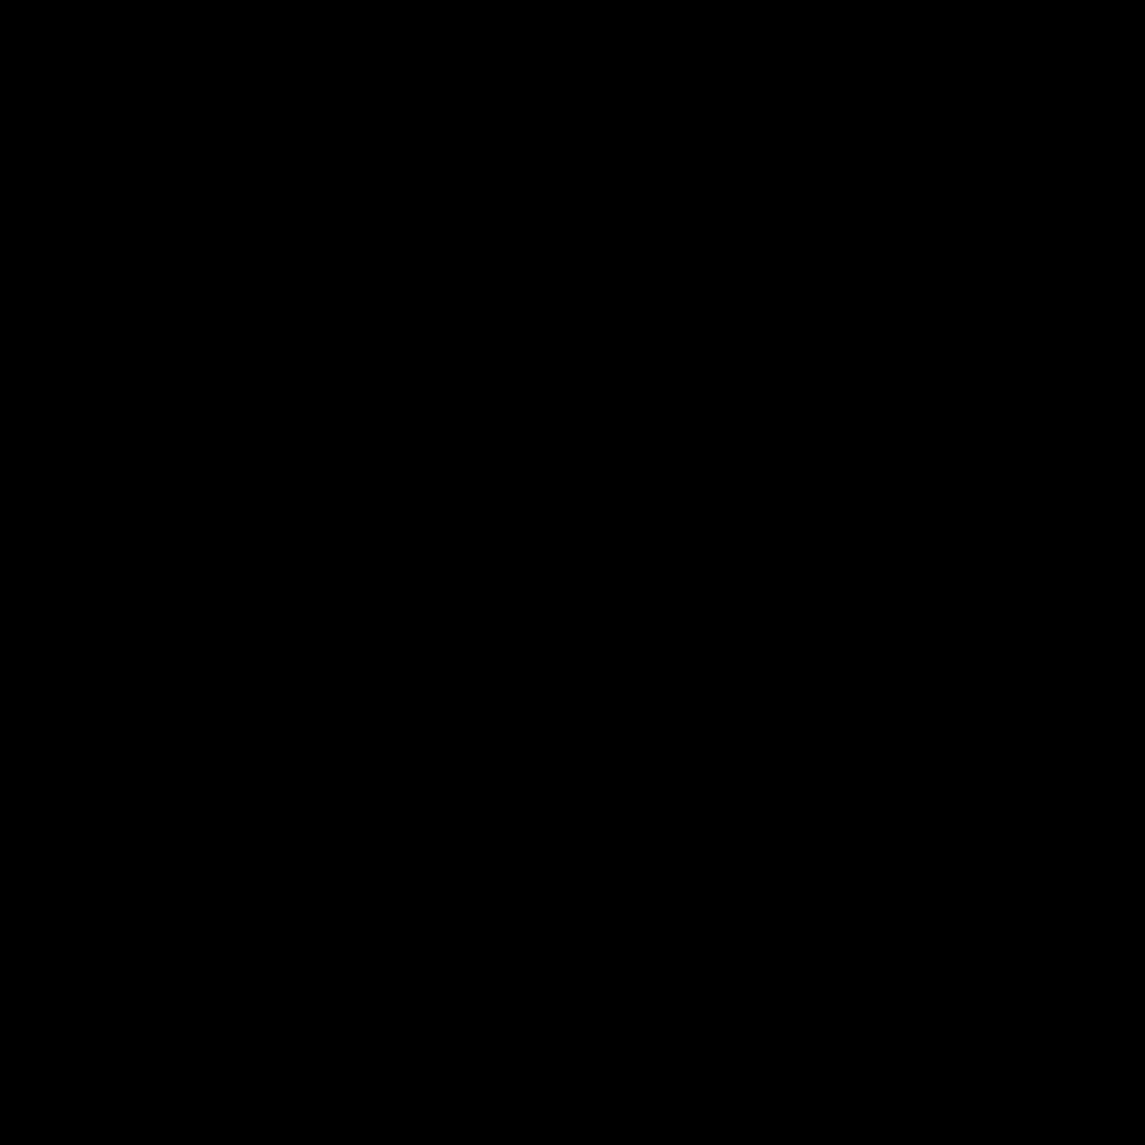 ALVARO DEL CASTILLO VEGA